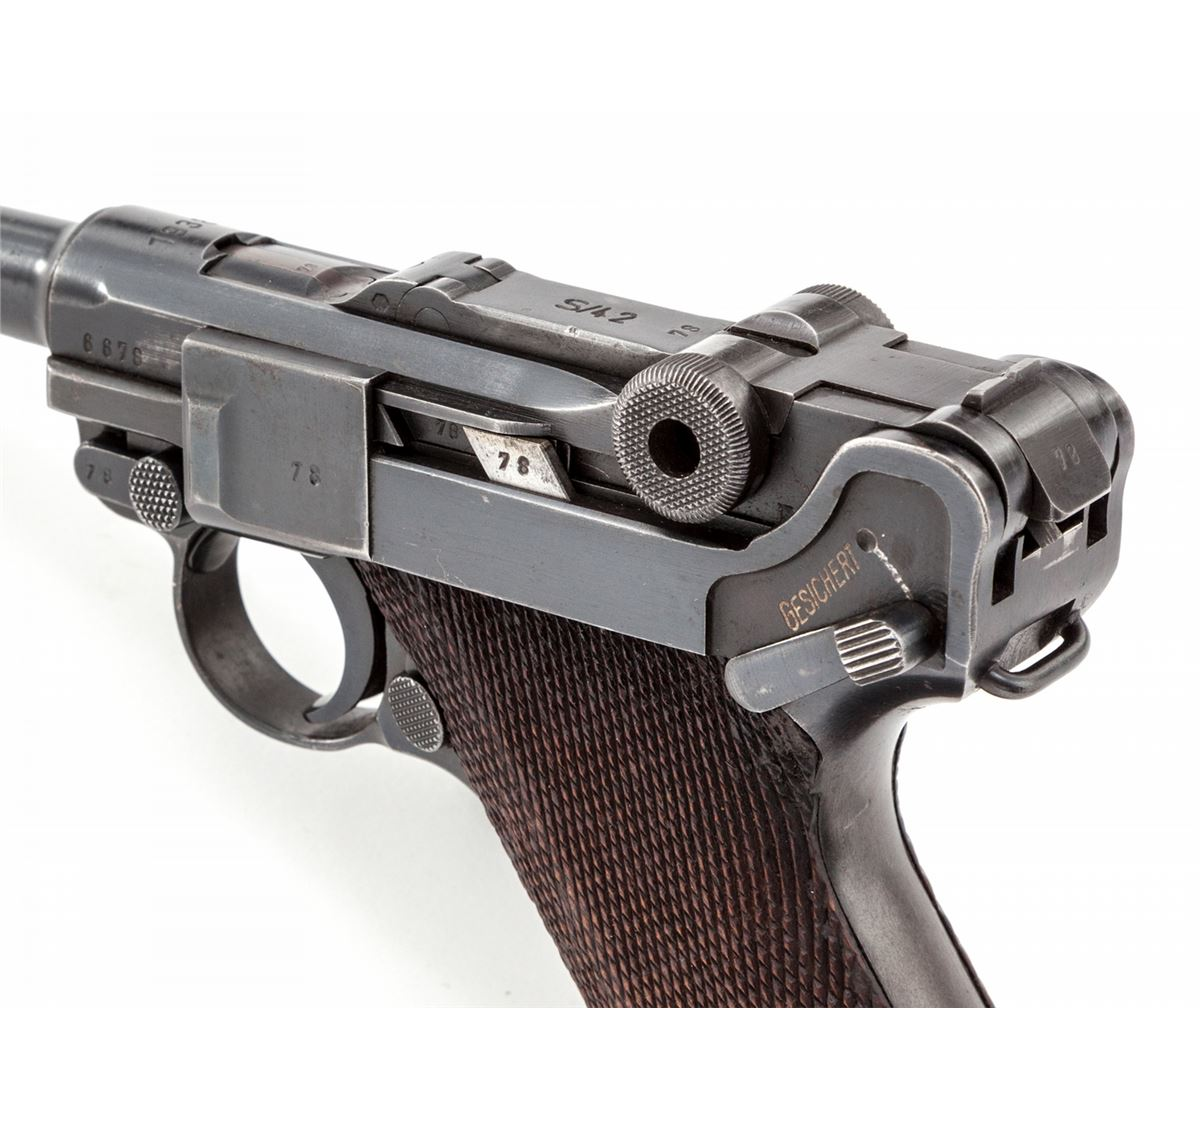 Mauser S/42 (1938) Luger